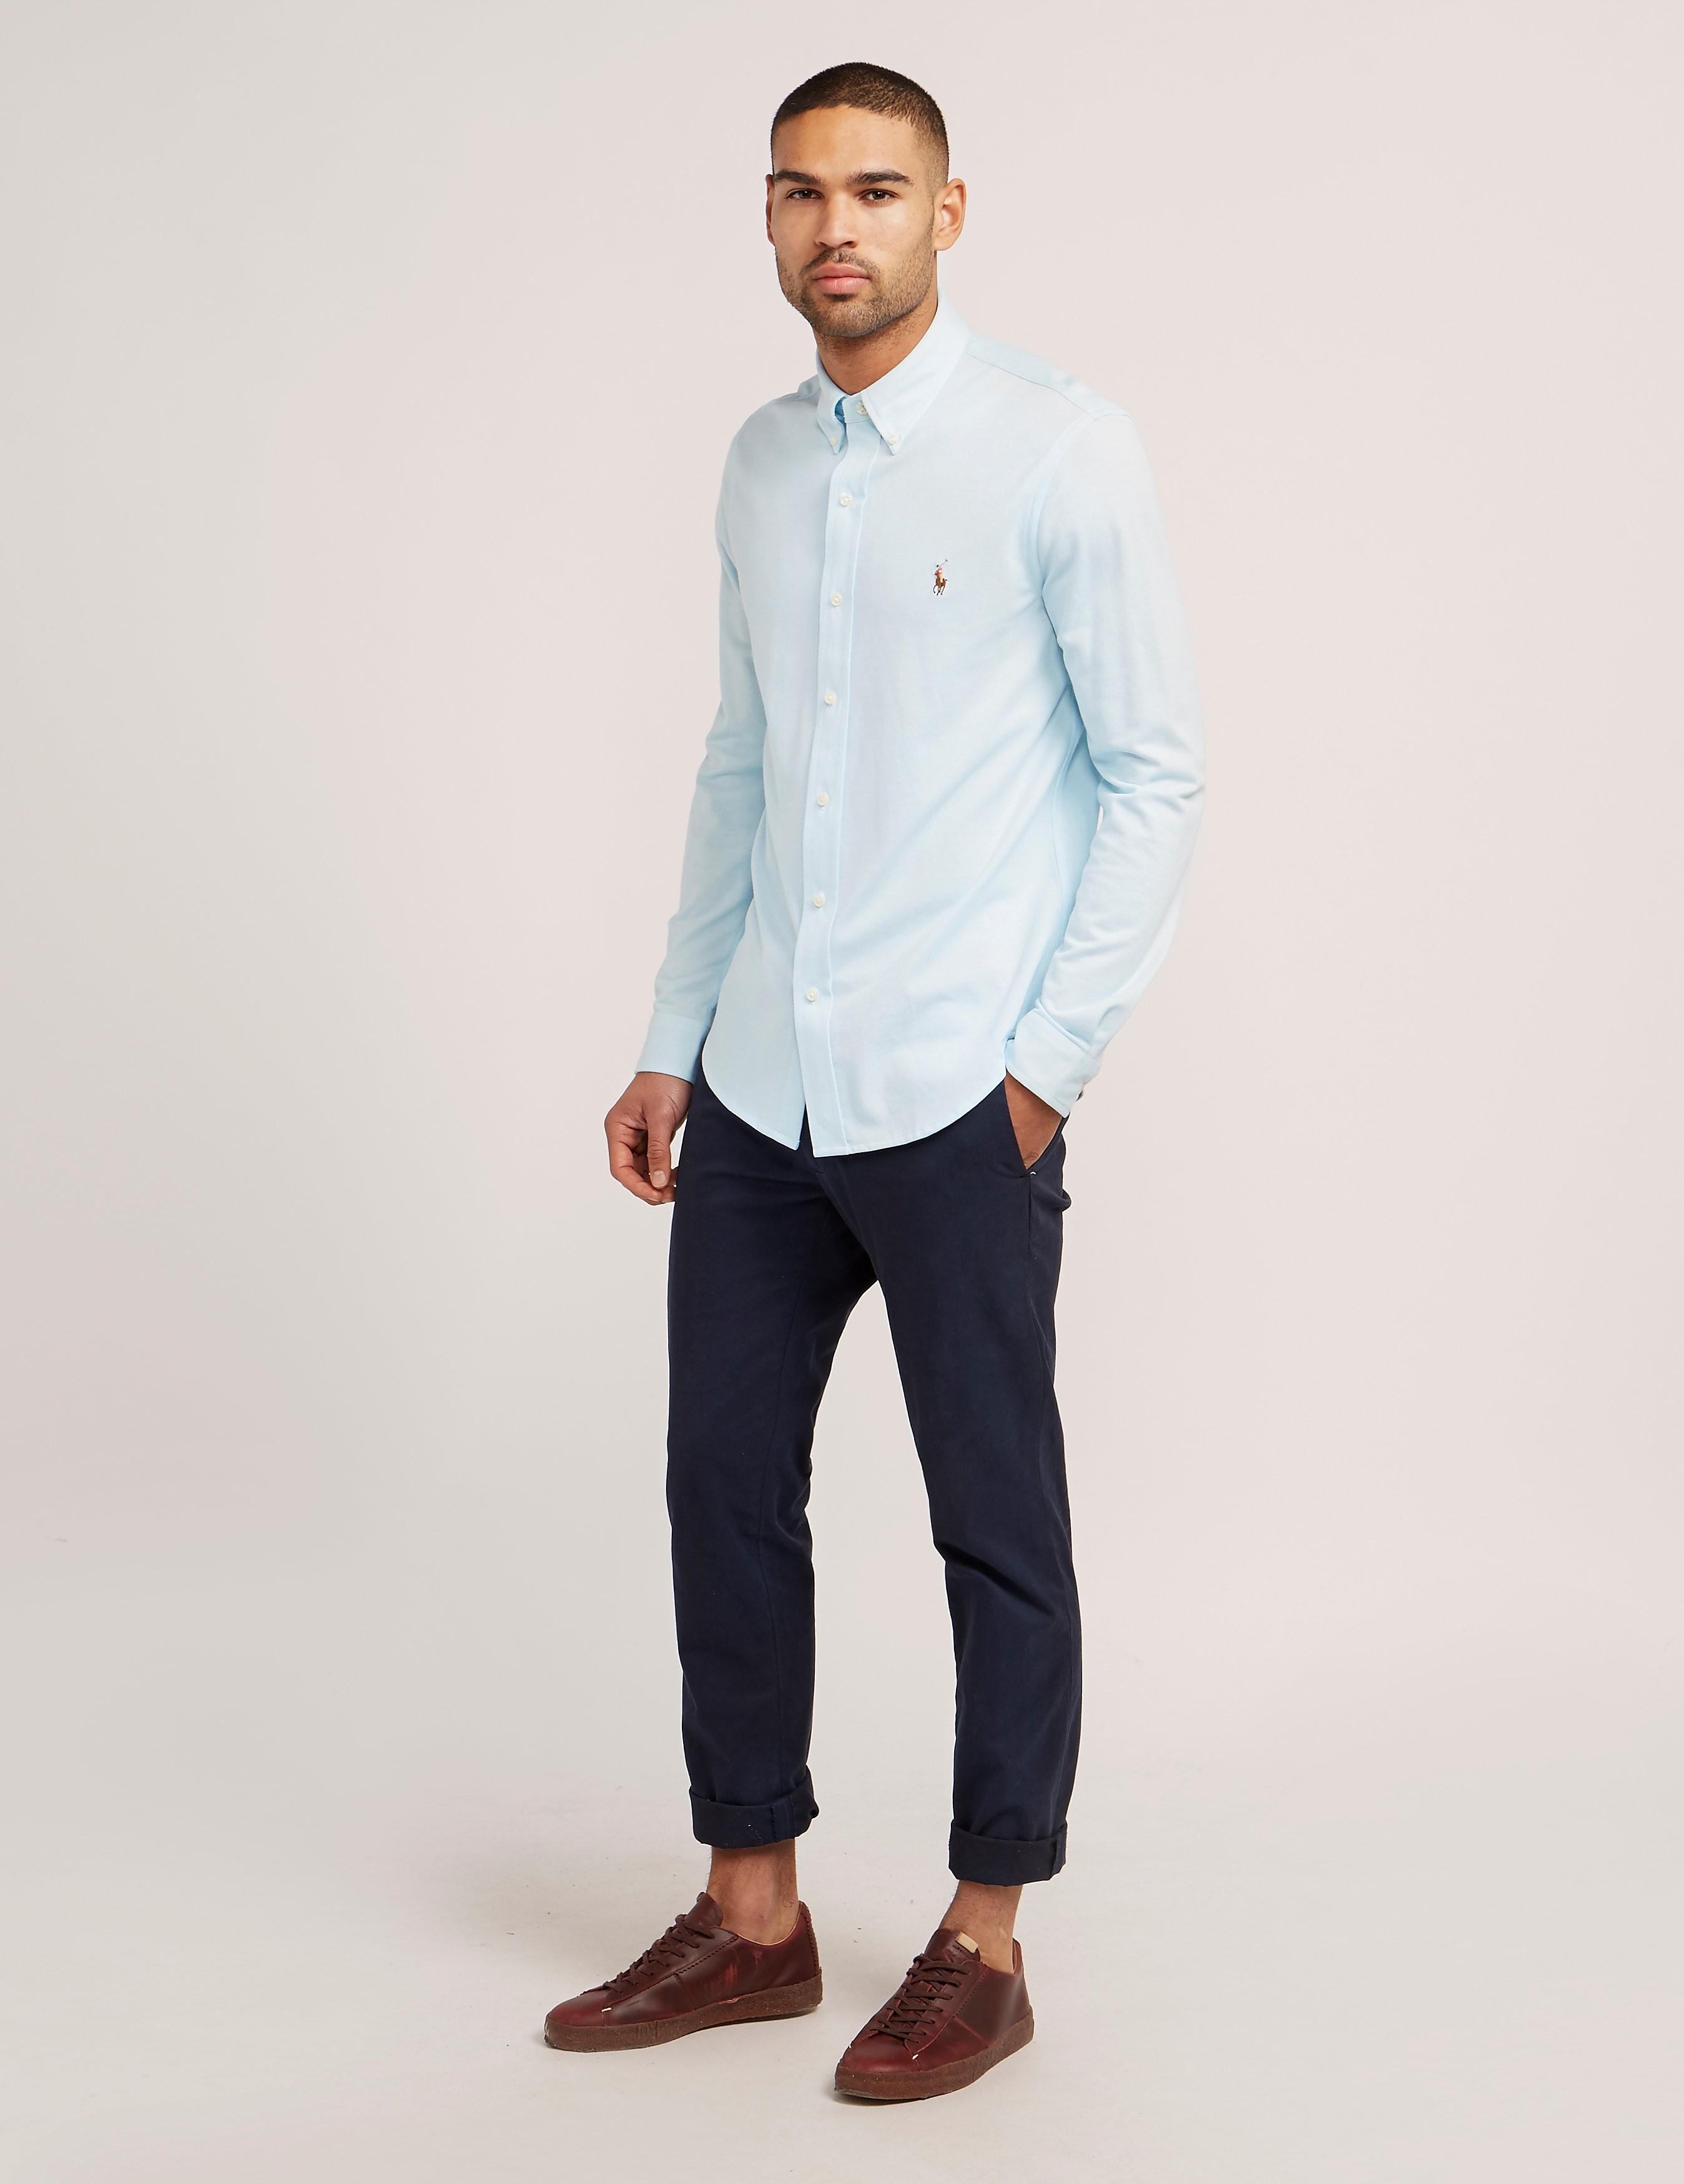 Polo Ralph Lauren Plain Knit Oxford Shirt